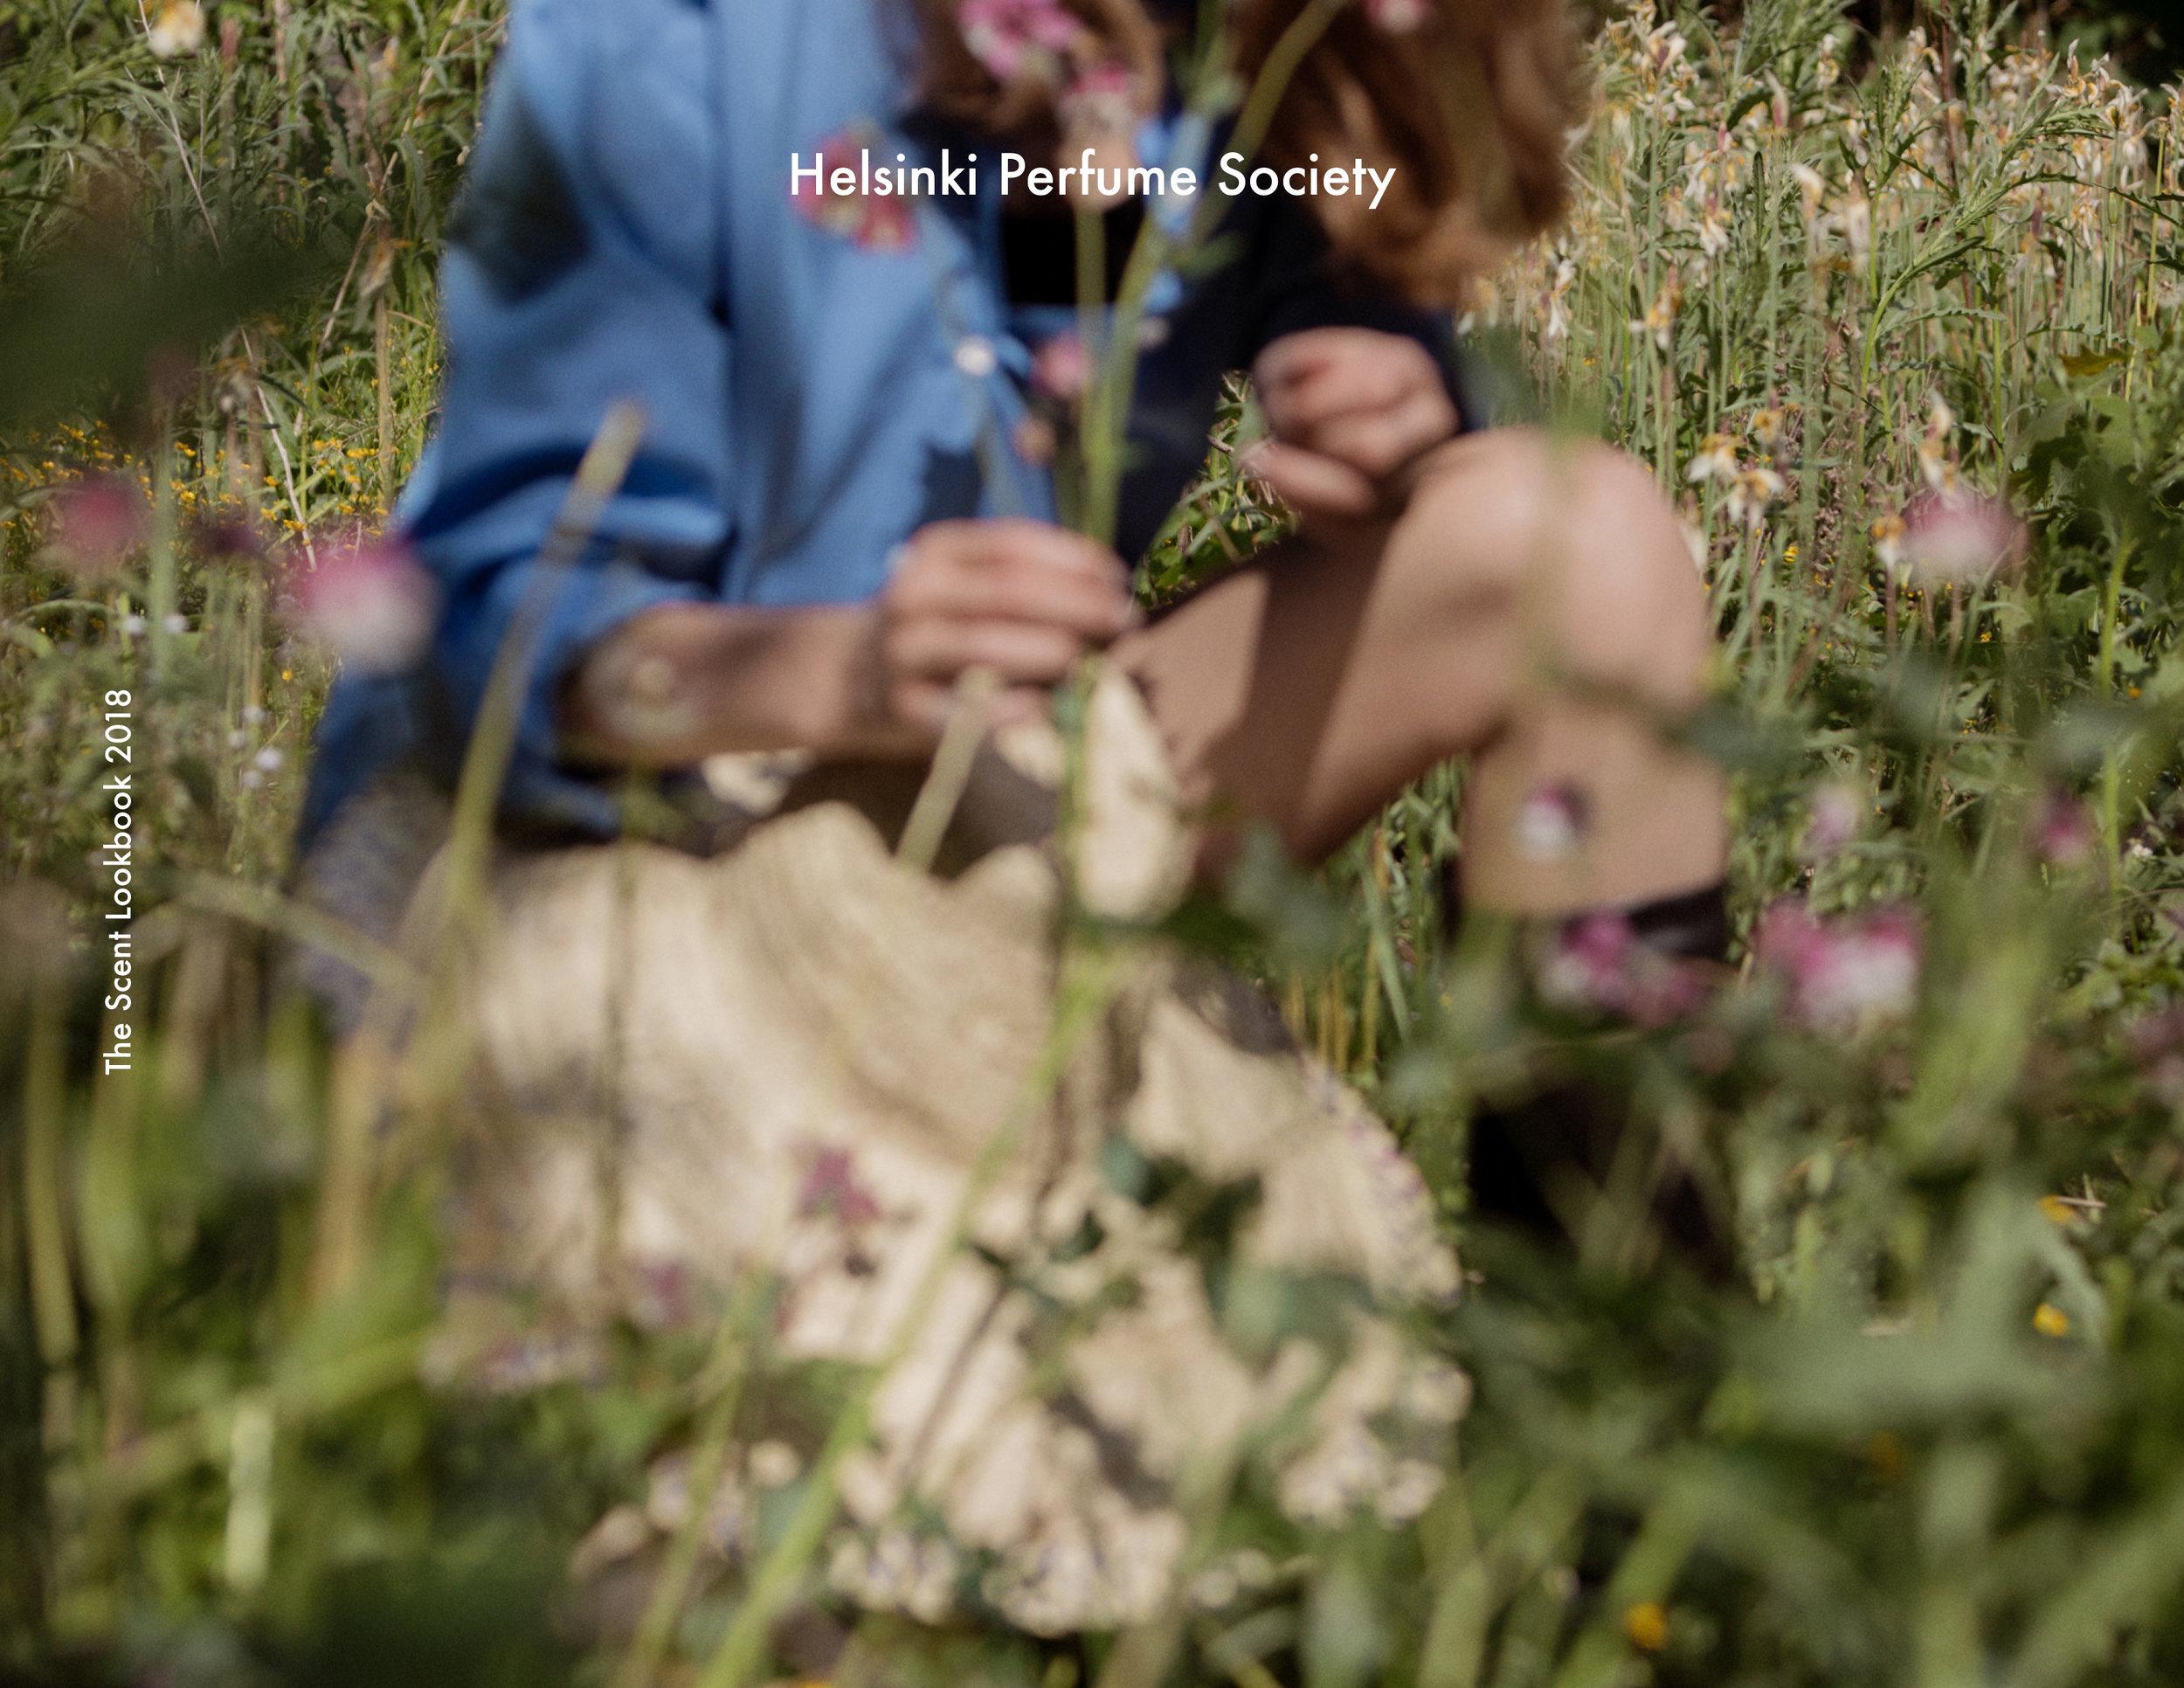 Helsinki_Perfume_Society_Lookbook_highres_1.jpg